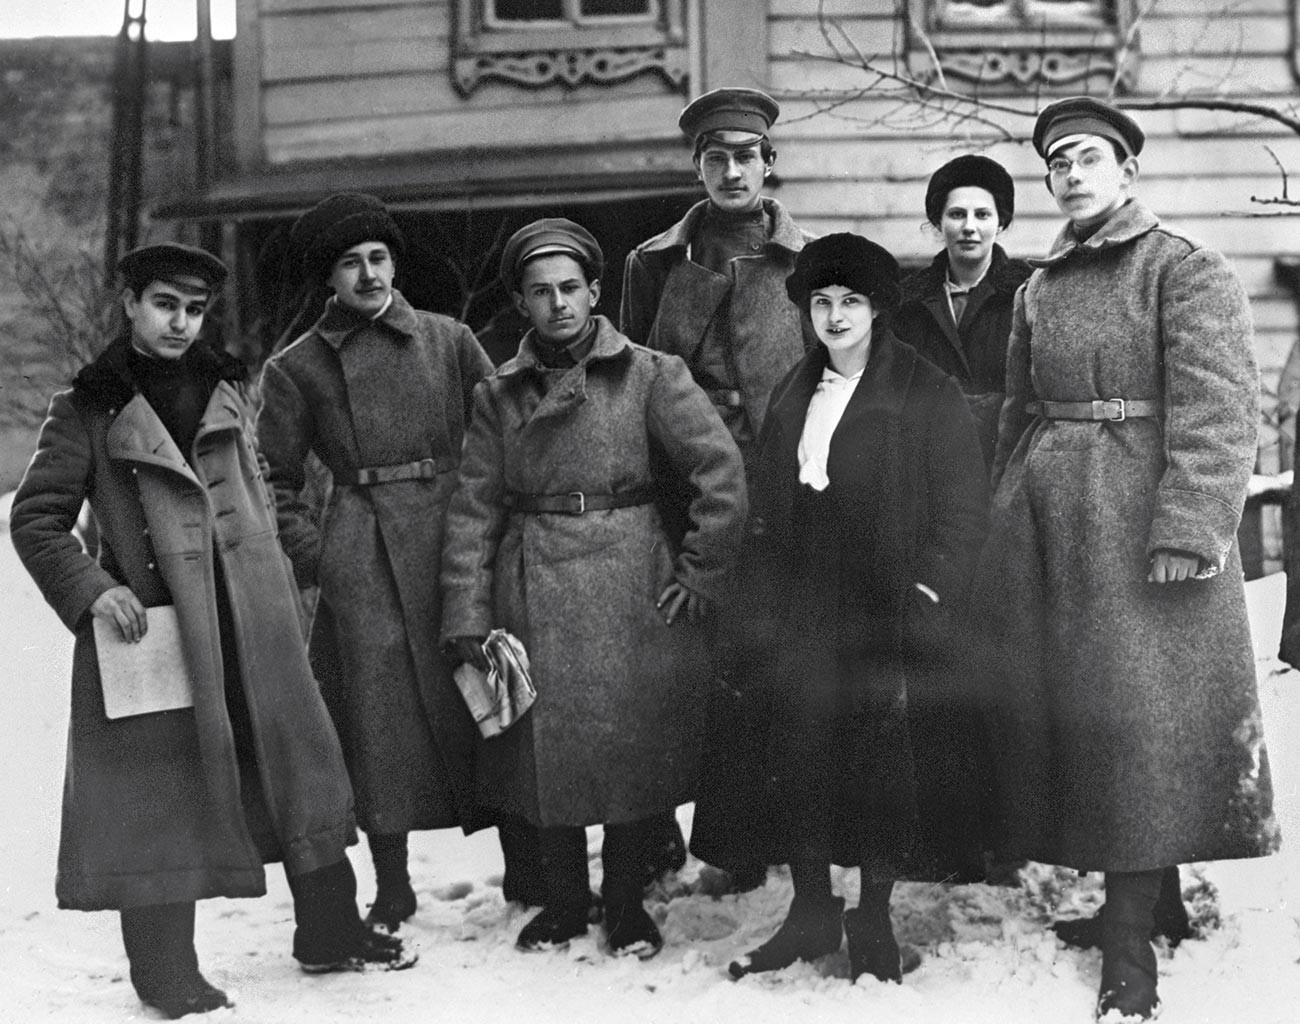 Generasi pertama Komsomol pada 1920-an.